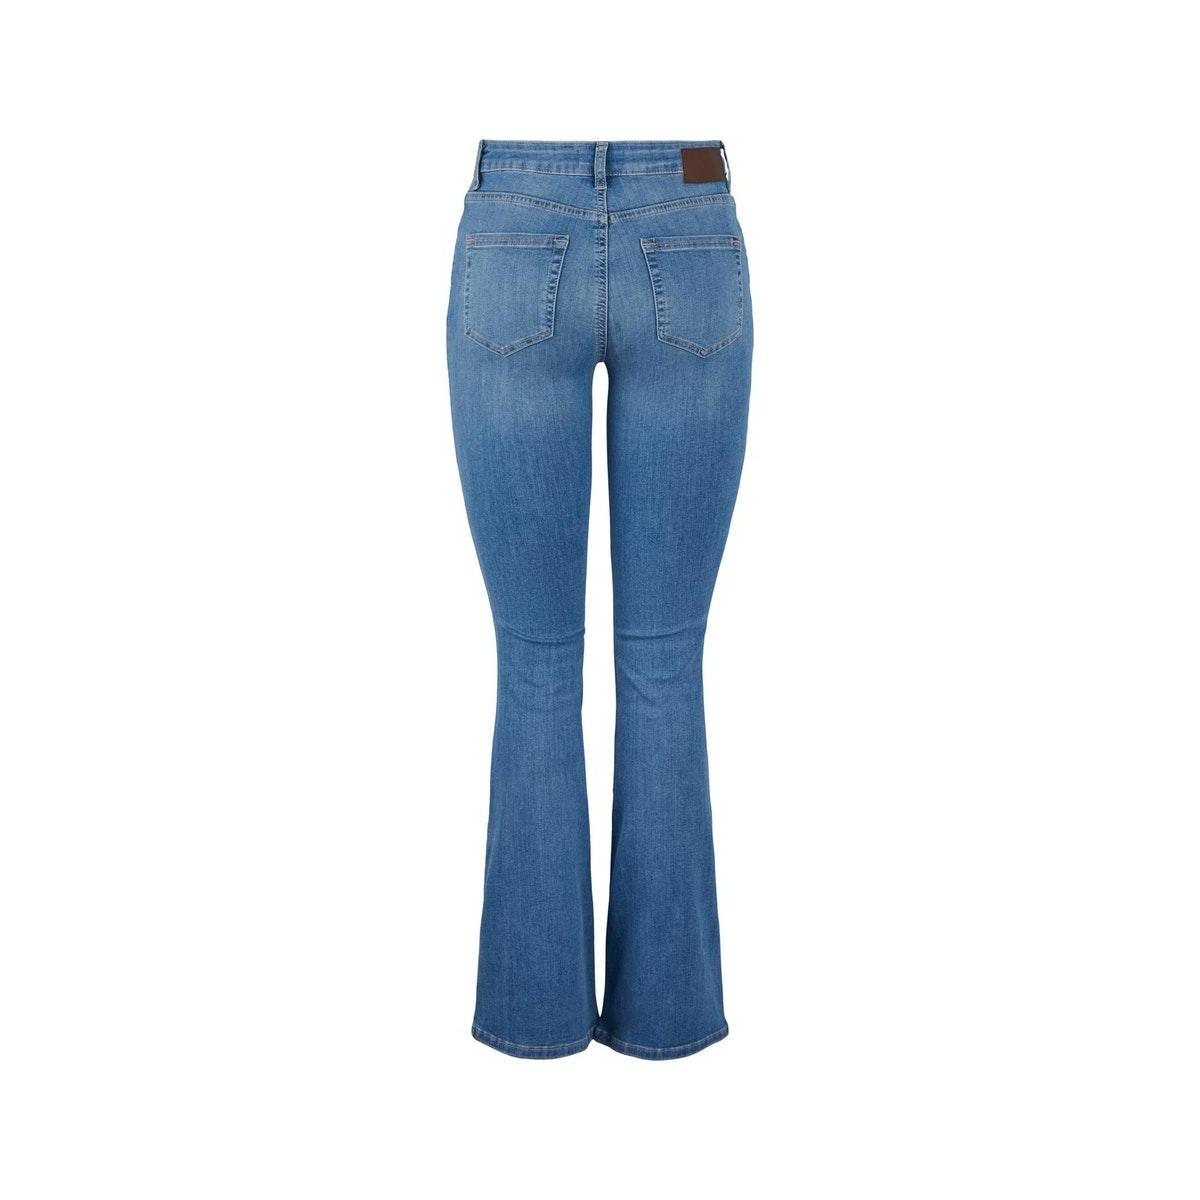 pcdelly dlx flared mw jeans lb124-b 17104850 pieces jeans light blue denim